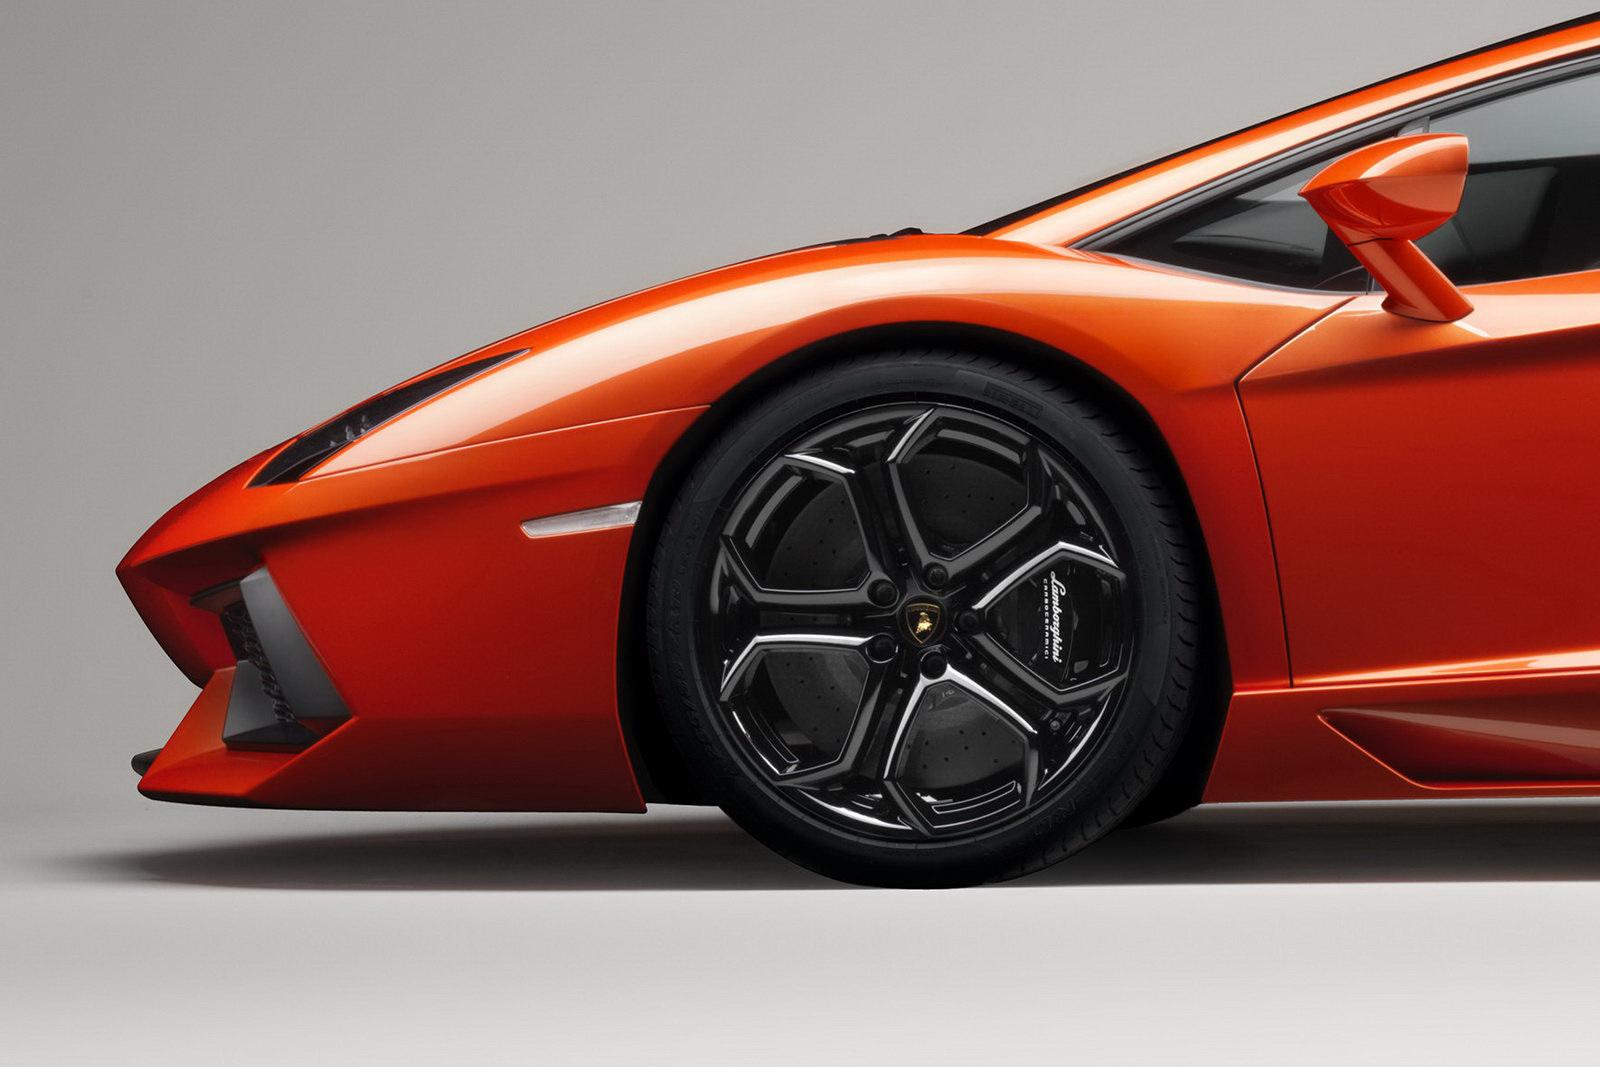 Luxury Lamborghini Cars Lamborghini Aventador Lp700 4